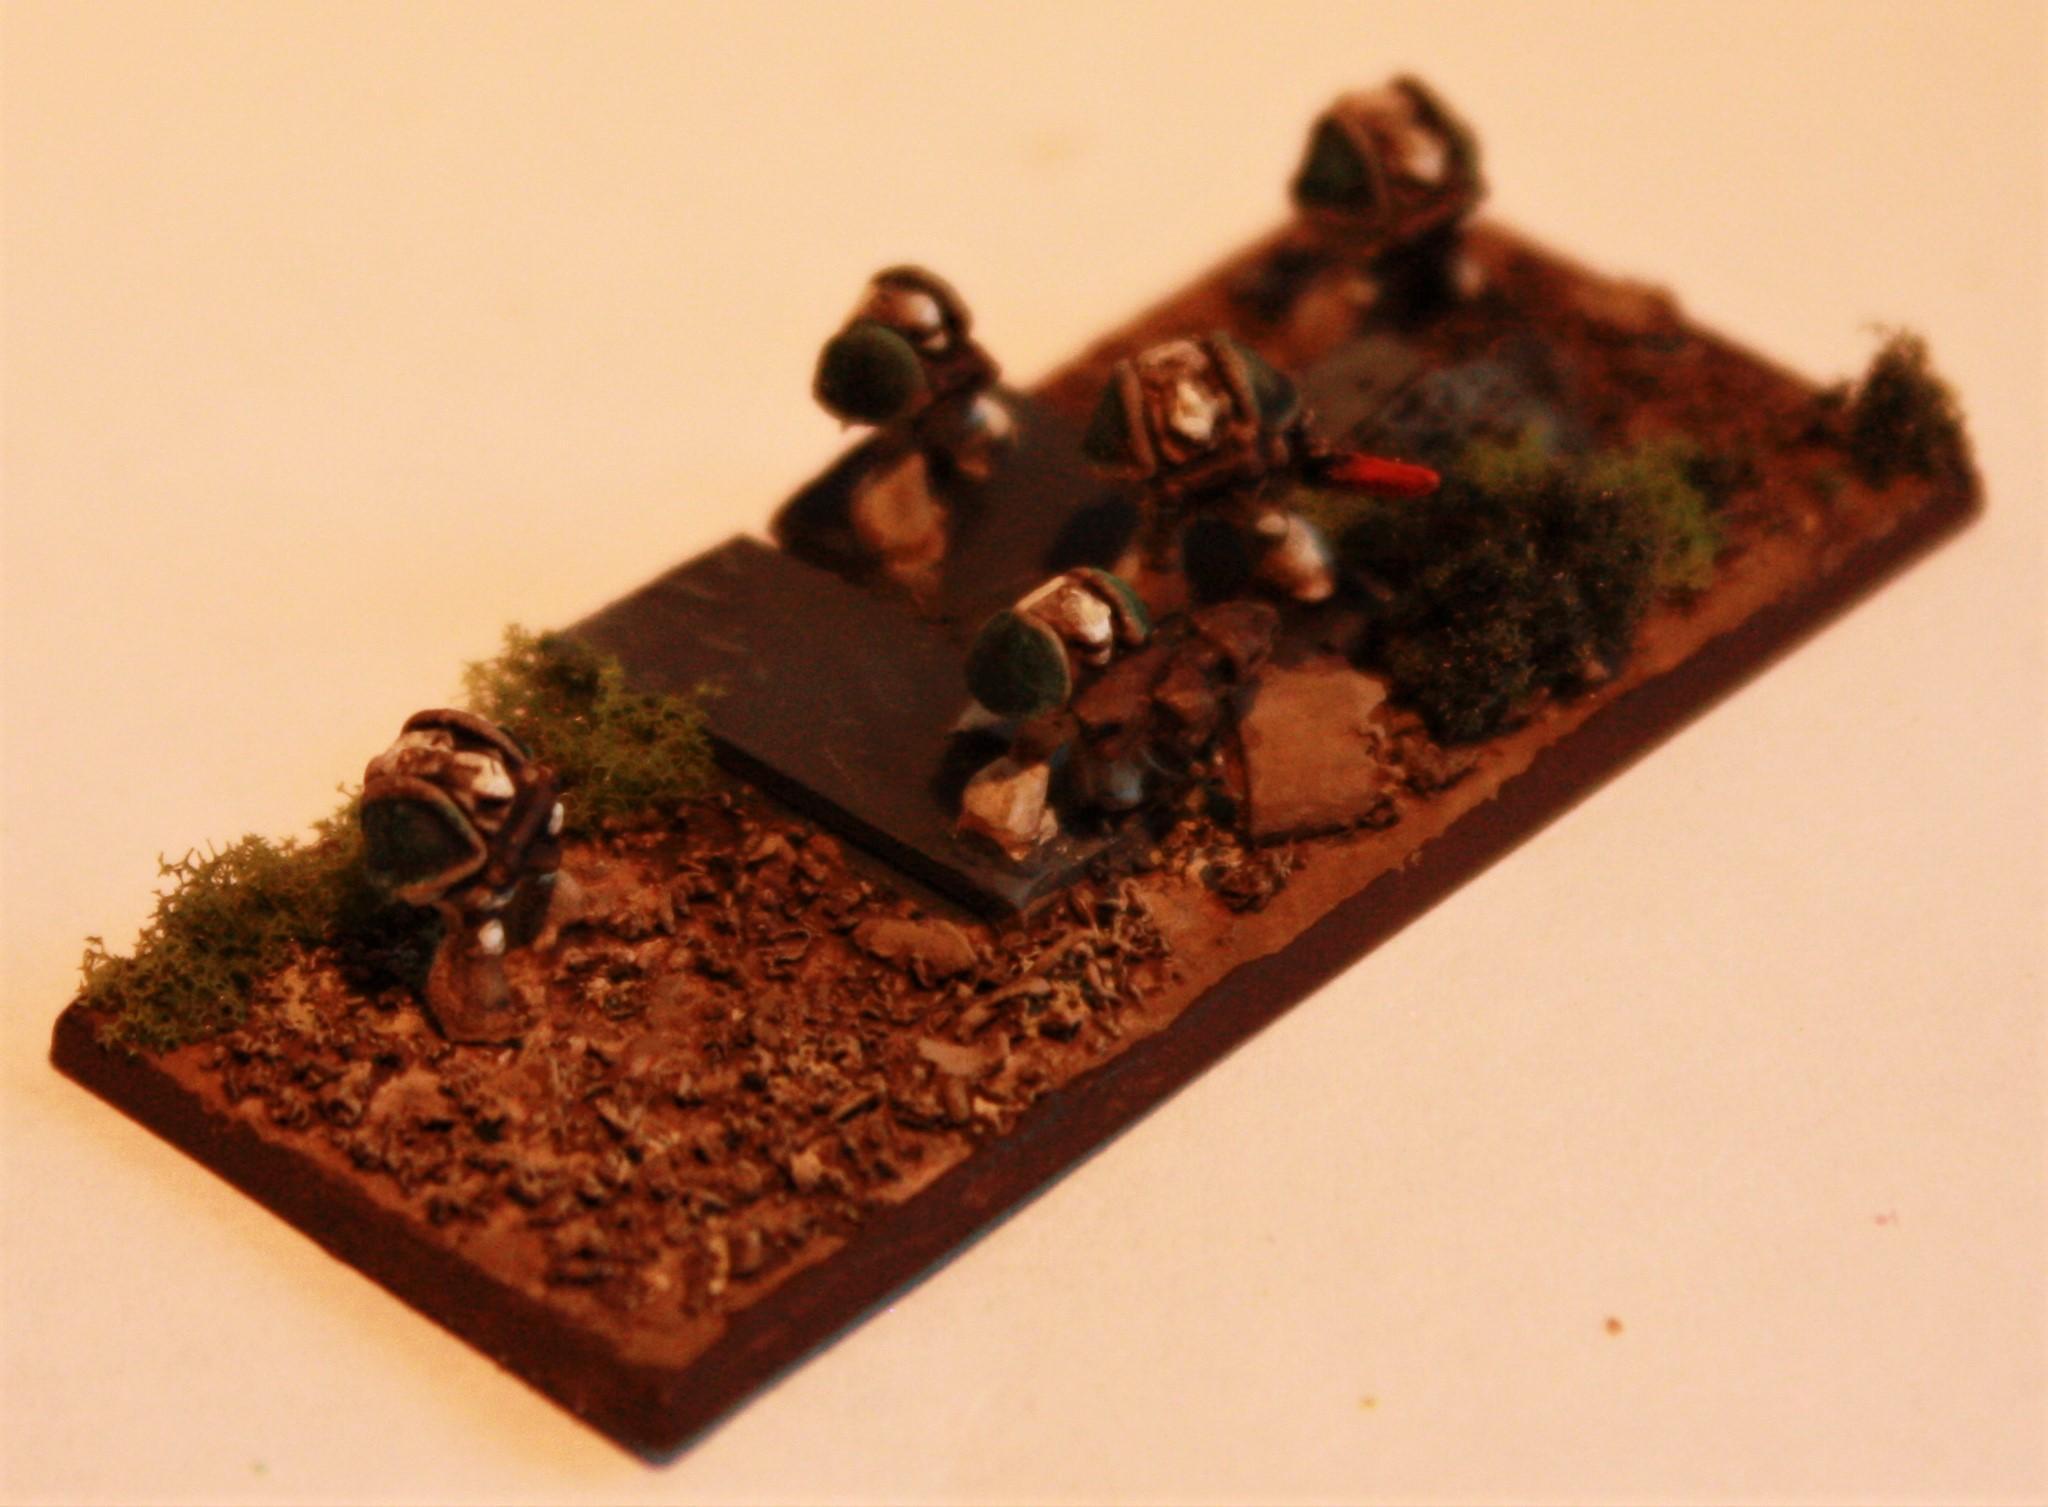 30k, 6mm, Death Guard, Epic, Space Marines, Warhammer 40,000, Xiv